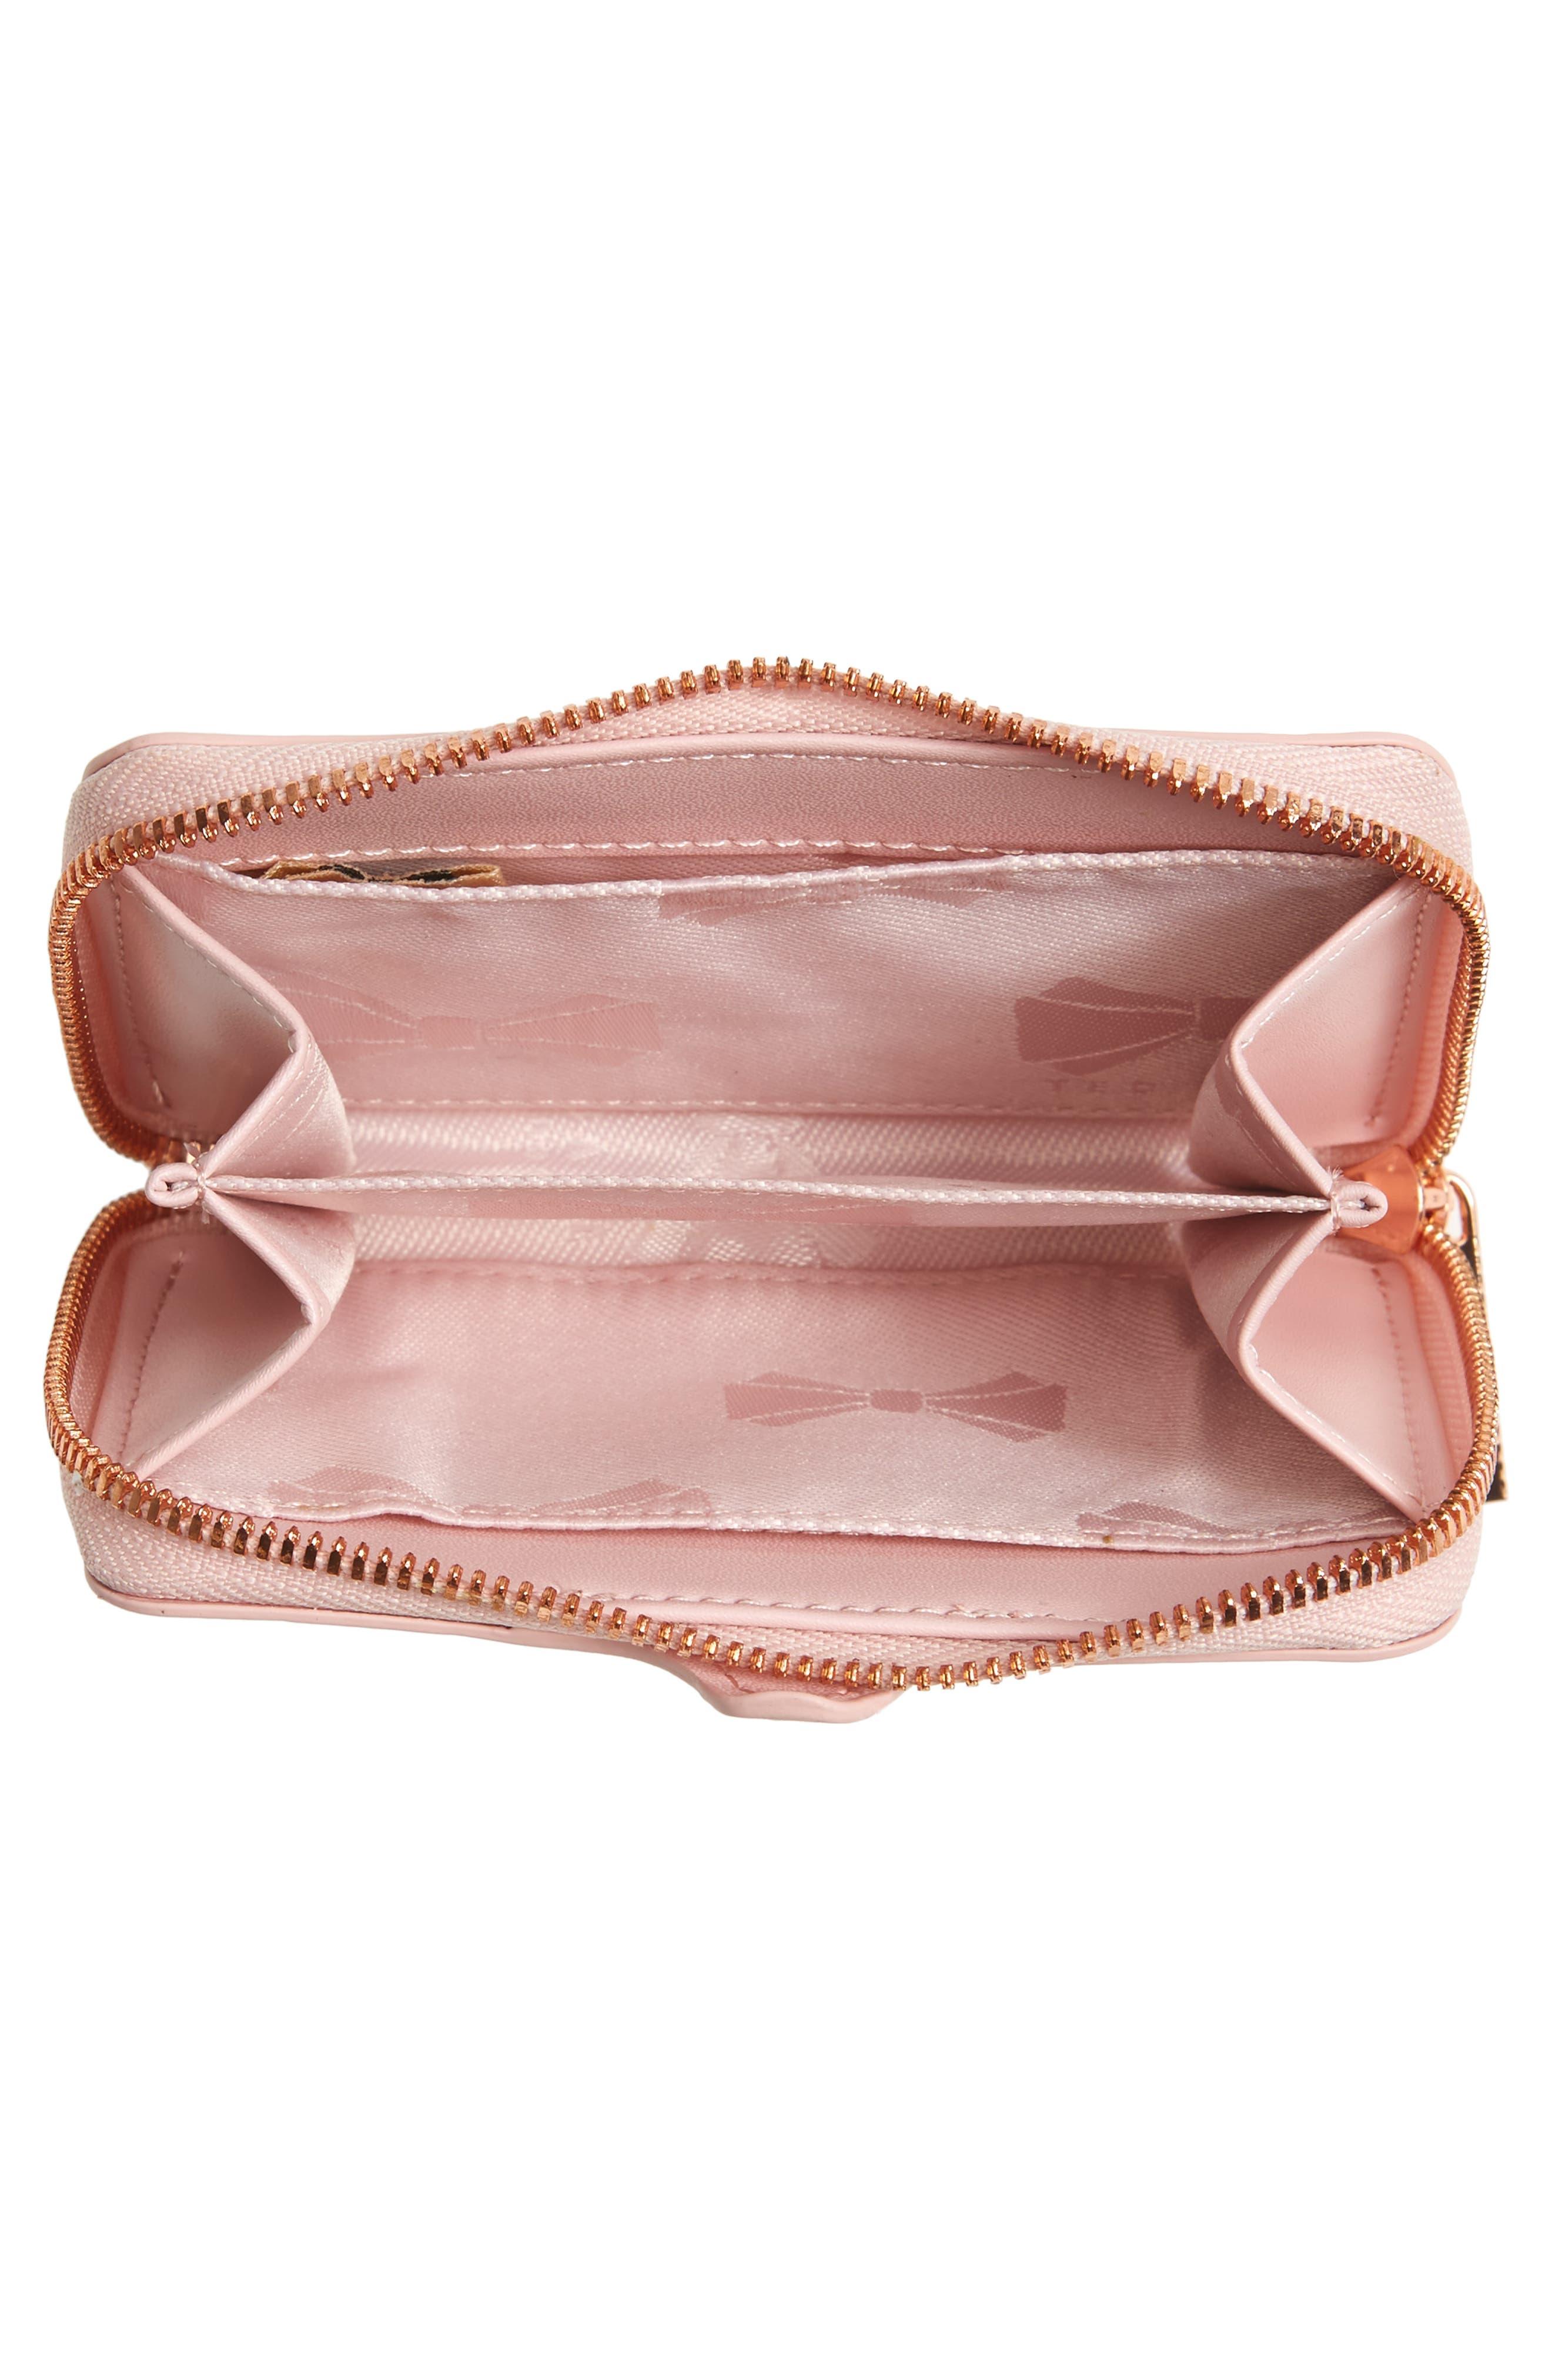 Danyela Leather Zip Purse,                             Alternate thumbnail 2, color,                             Light Pink